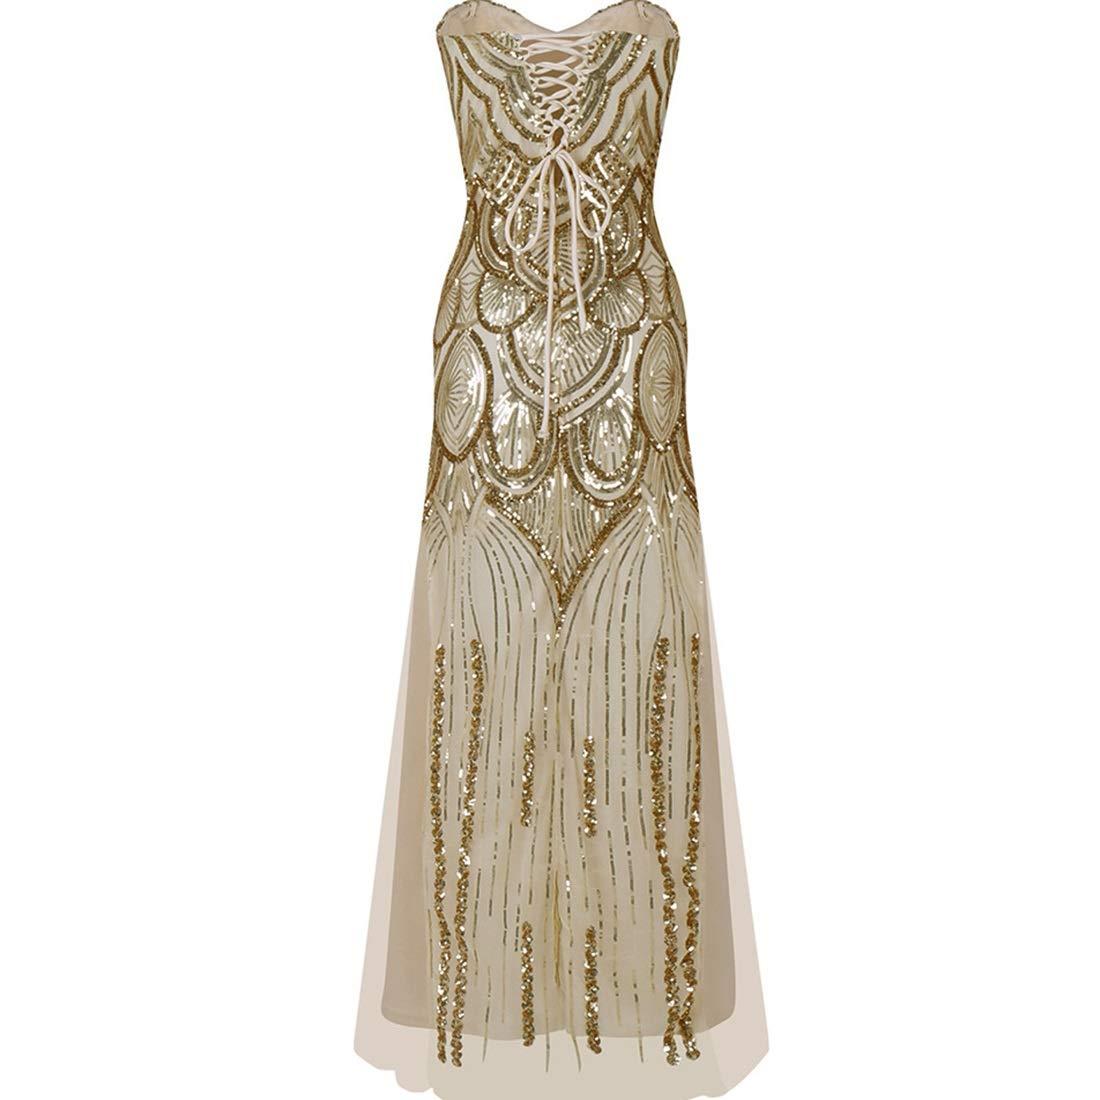 Souliyan Women's Slim Strap FanShaped Sequined Tube Top Dress (Size   S)